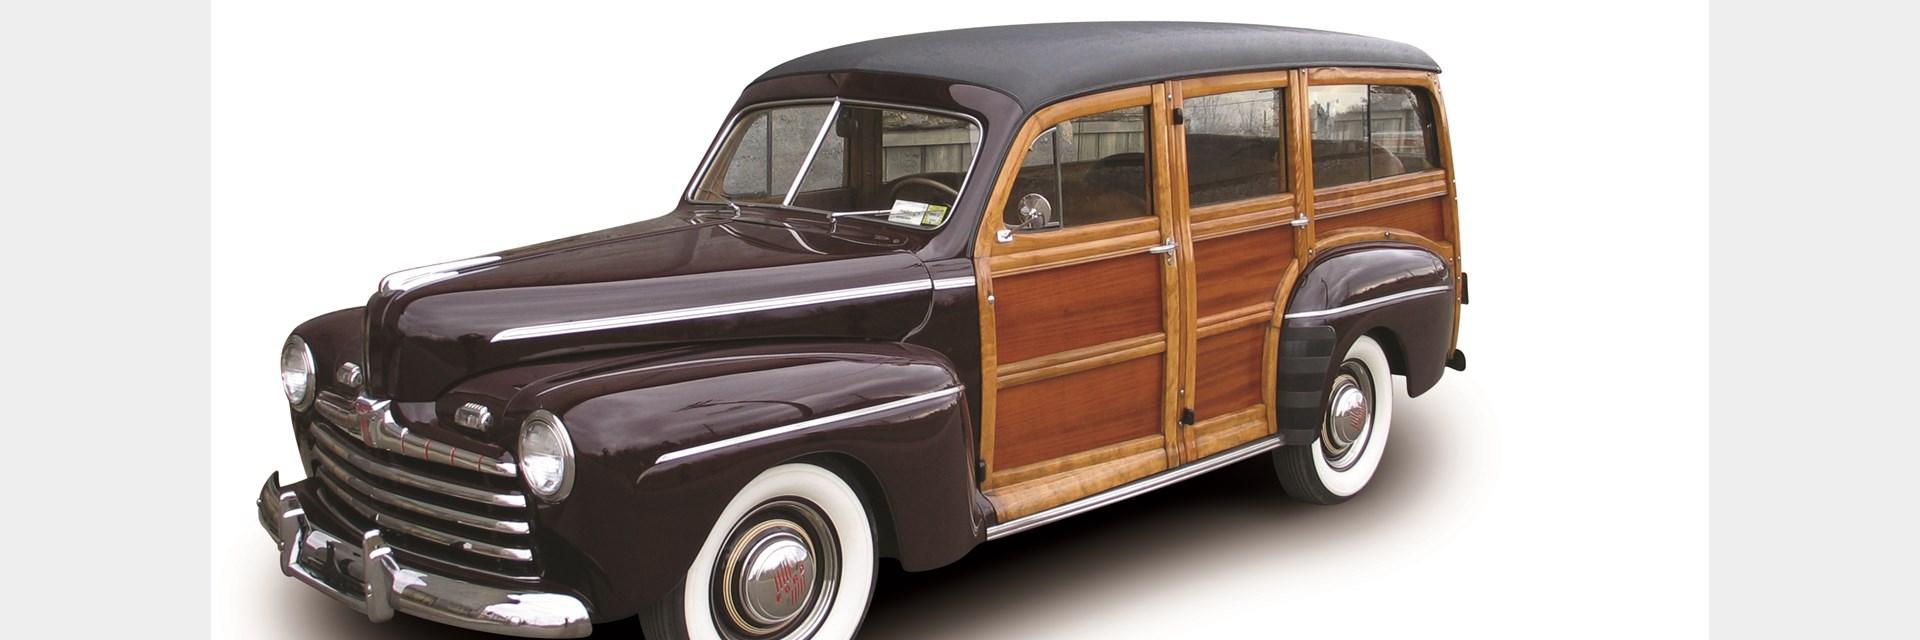 Michigan International Spring Classic Car Auction